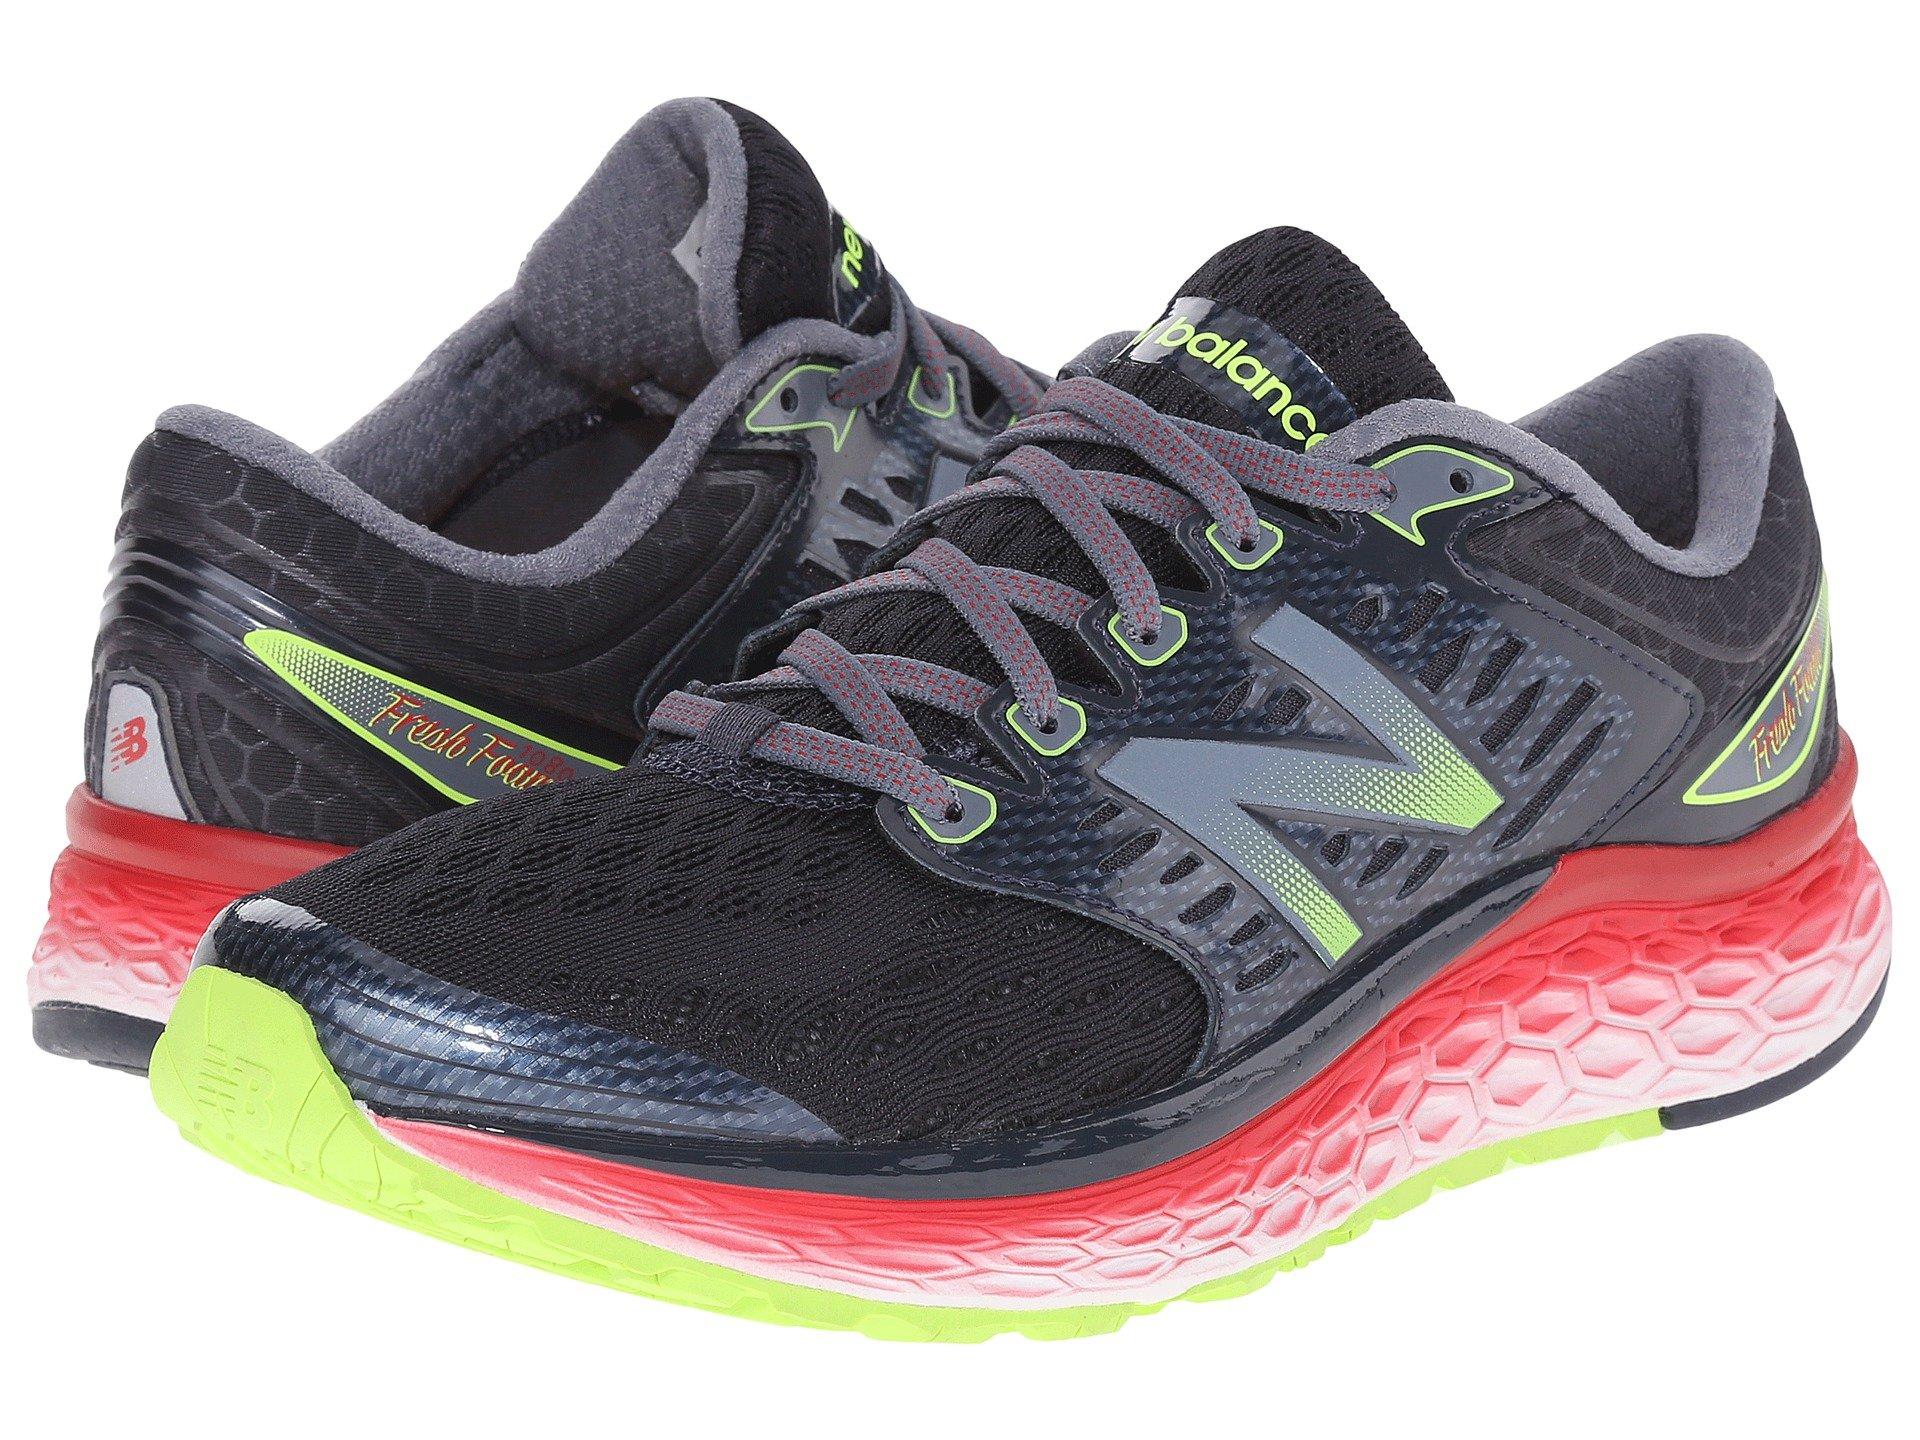 New Balance M 1080 Sb6 Running Shoes Mens Silver Black